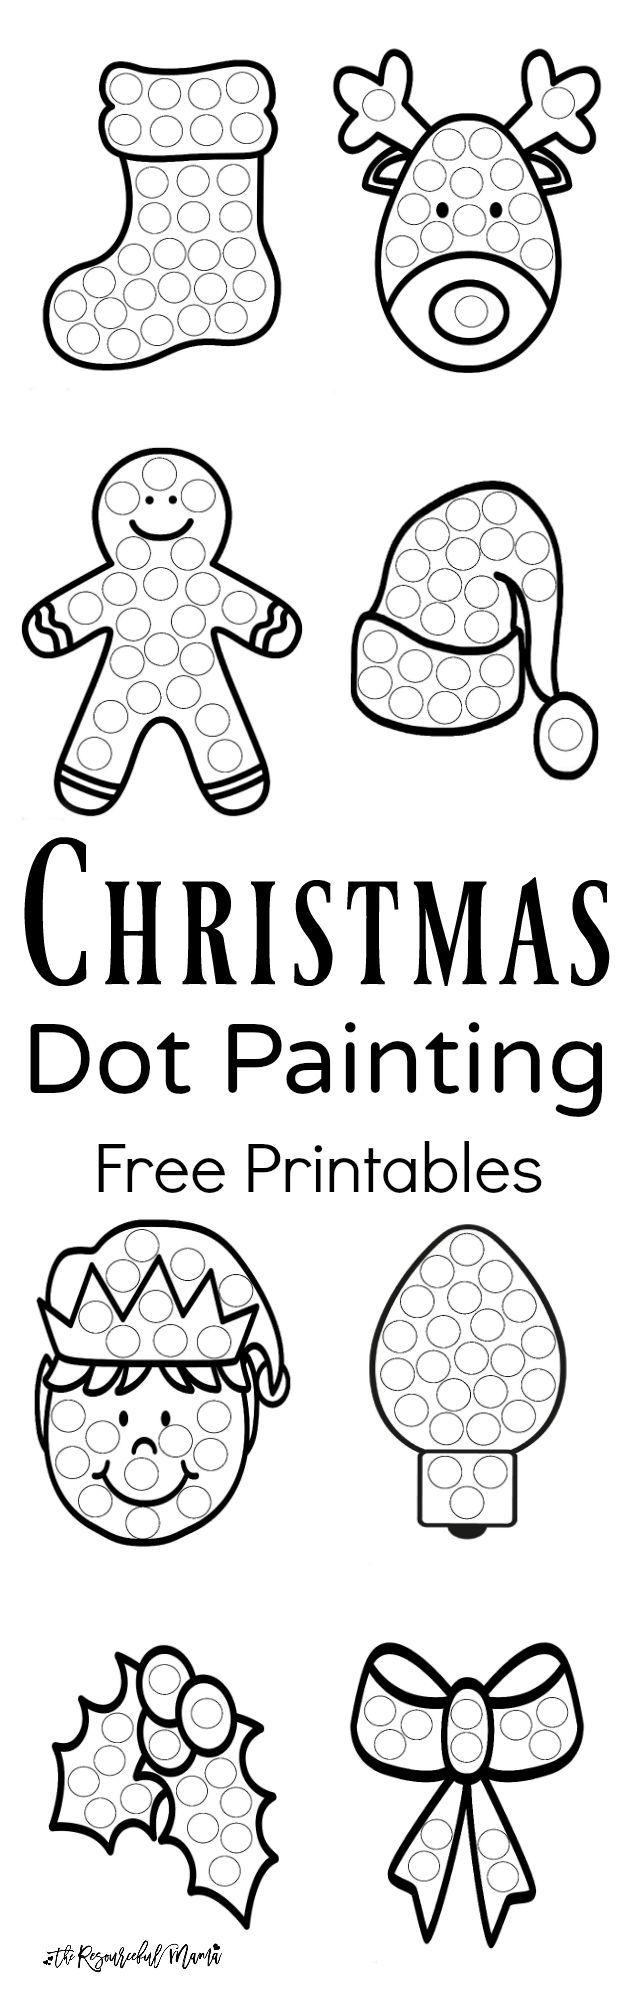 Christmas Dot Painting Free Printables Preschool Christmas Christmas Kindergarten Christmas Activities [ 2000 x 630 Pixel ]